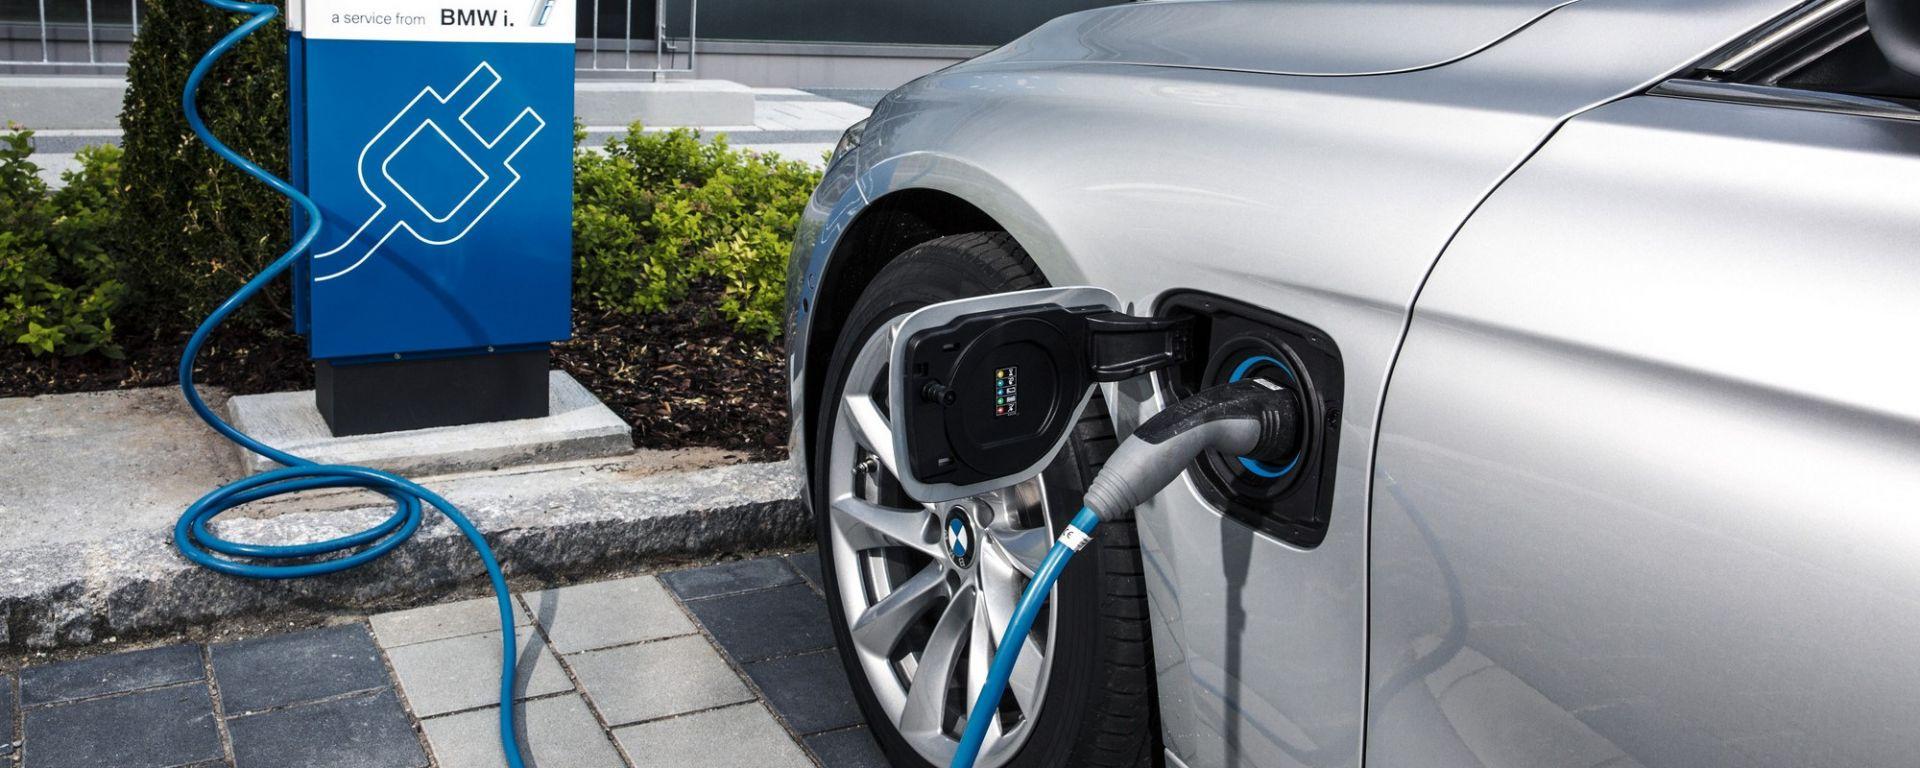 BMW 330e e 330e Touring, dal 2020 Serie 3 berlina e wagon plug-in hybrid